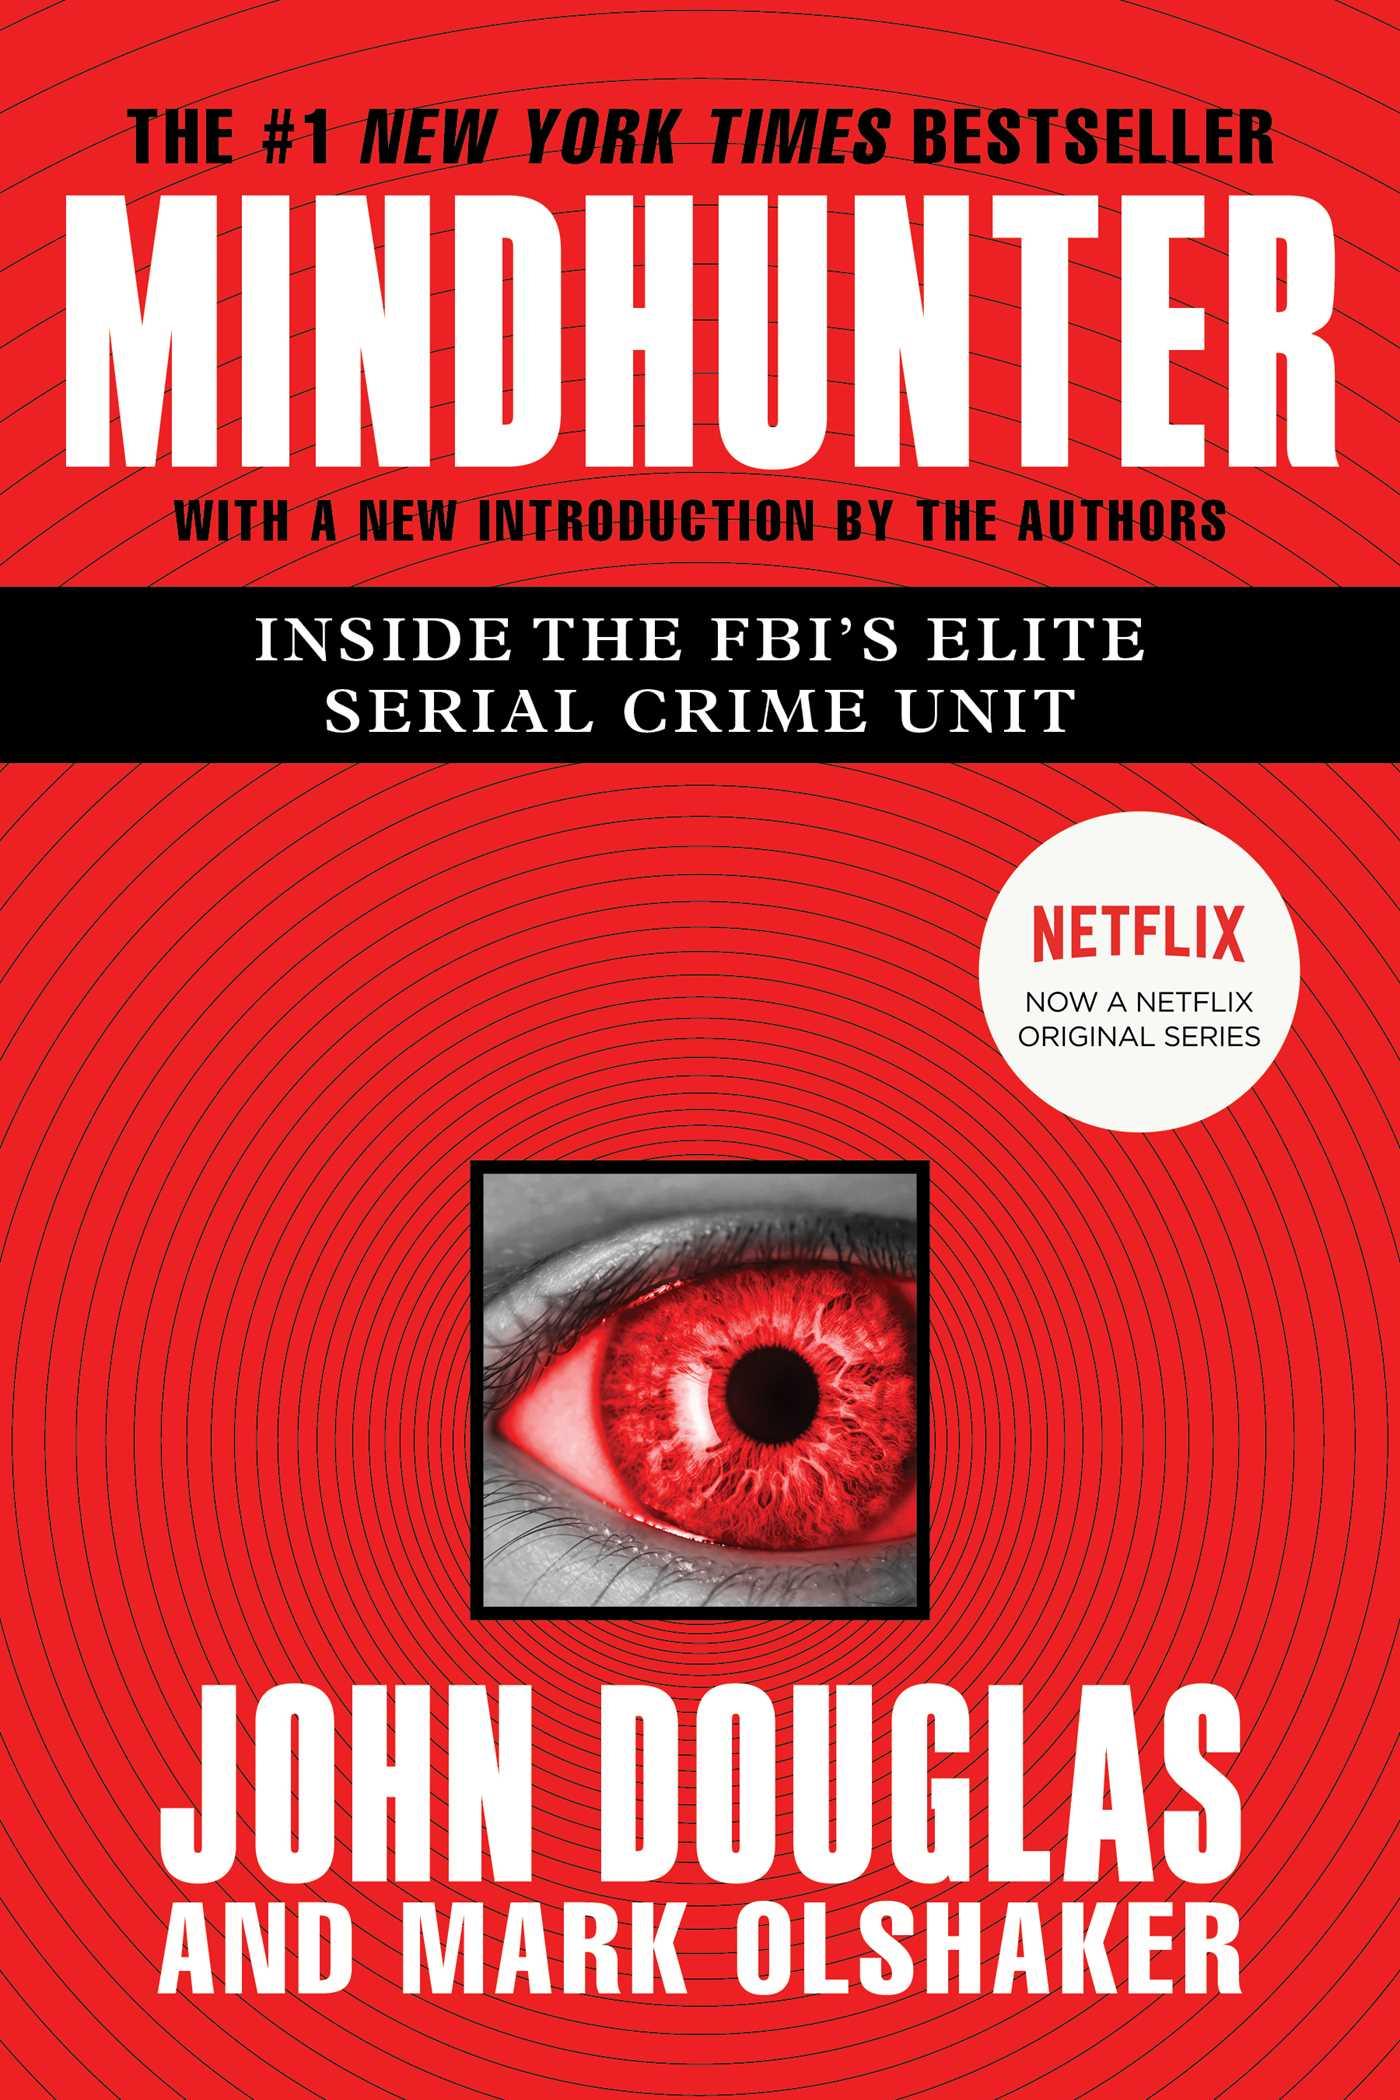 Mindhunter by John Douglas and Mark Olshaker